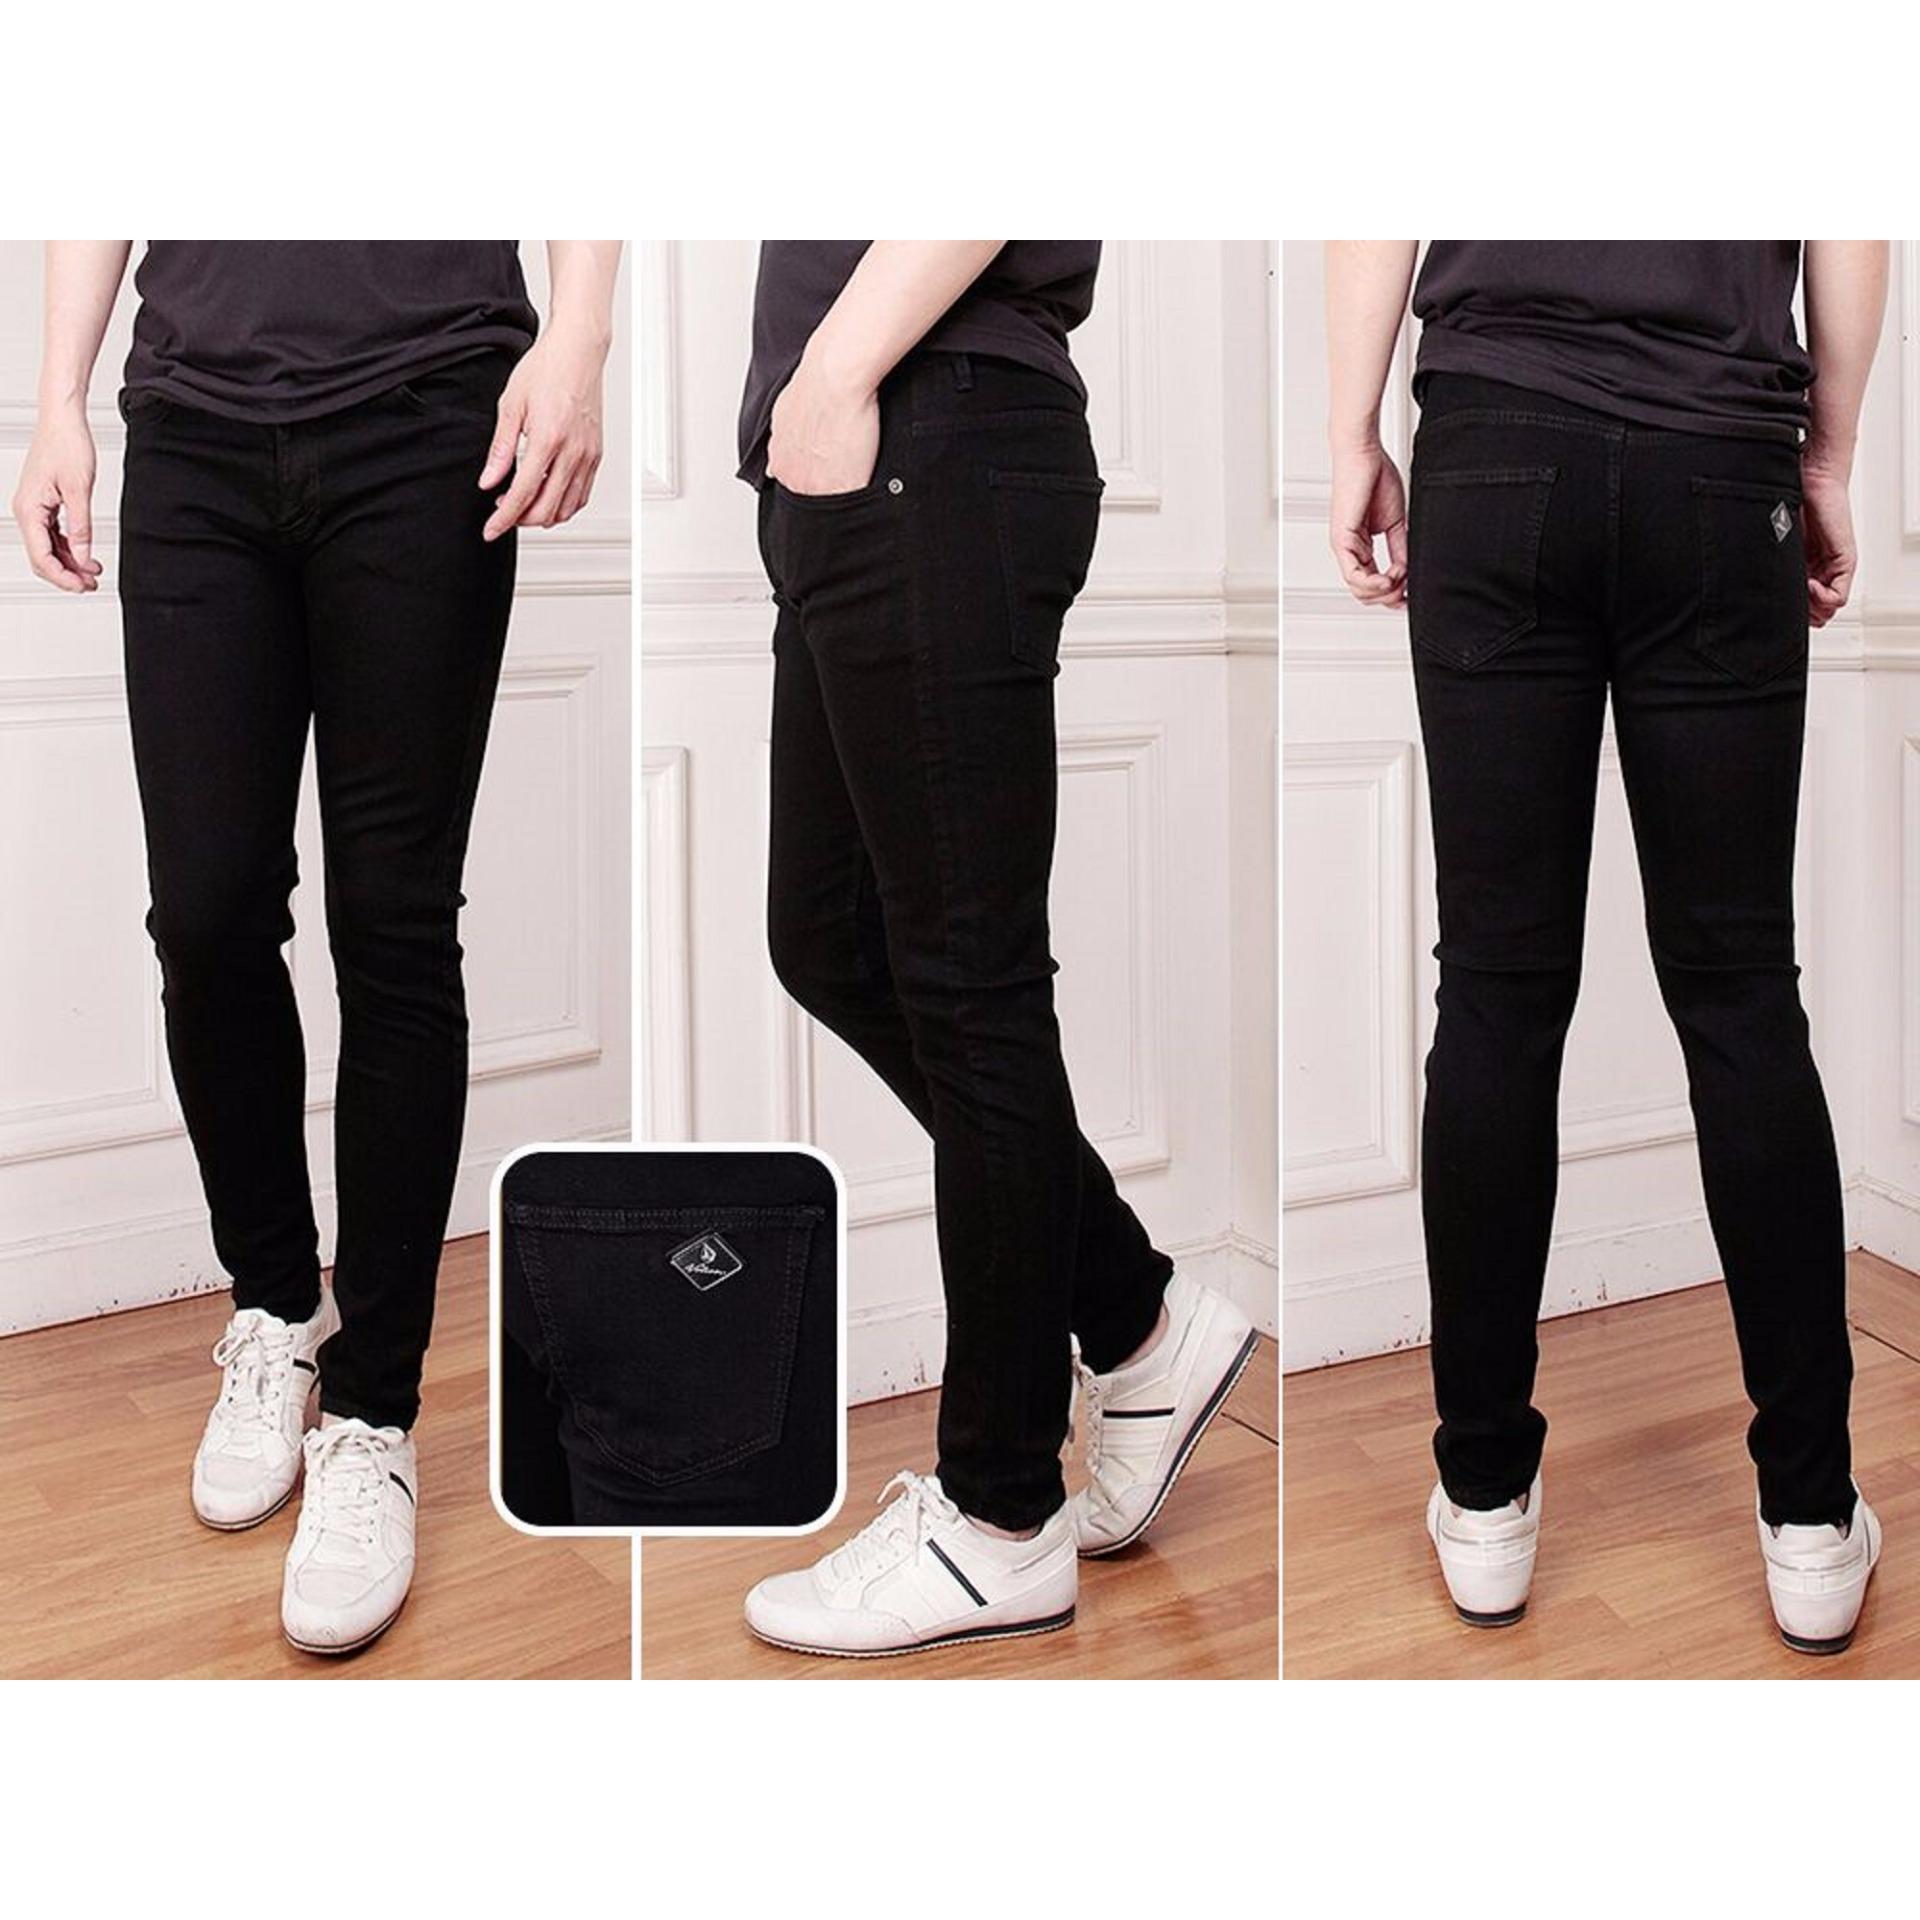 Nusantara Jeans Celana Pria Model Skinny Pensil Melar Street Hitam